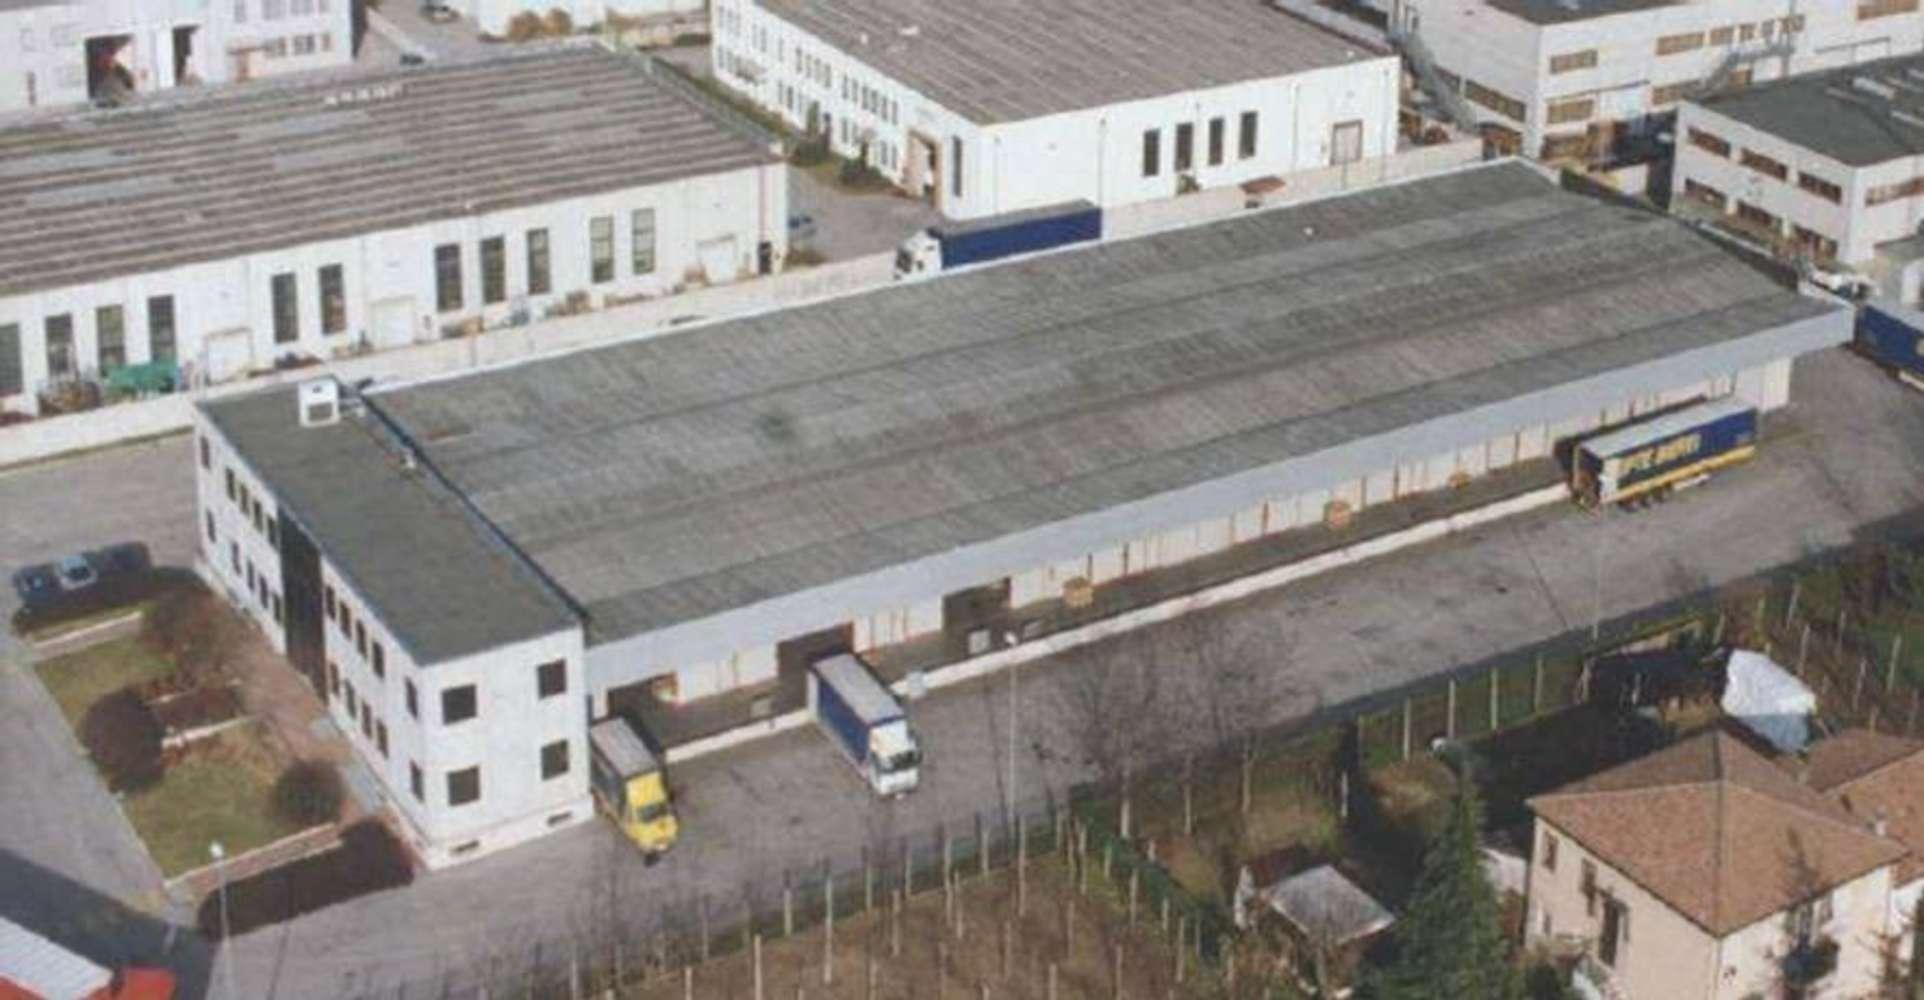 Magazzini industriali e logistici Rubano, 35030 - Immobile logistico Rubano (PD)